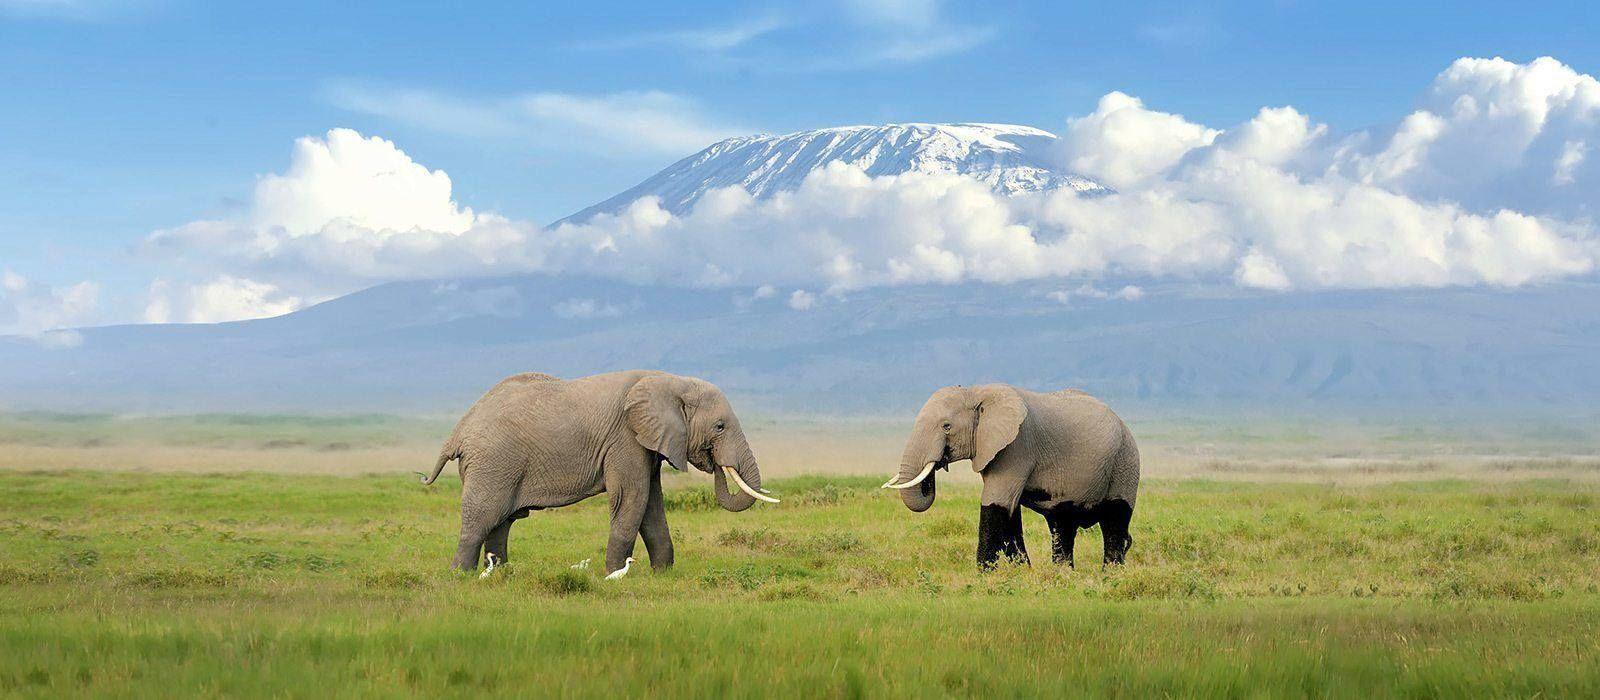 Mwanza Safari Tours